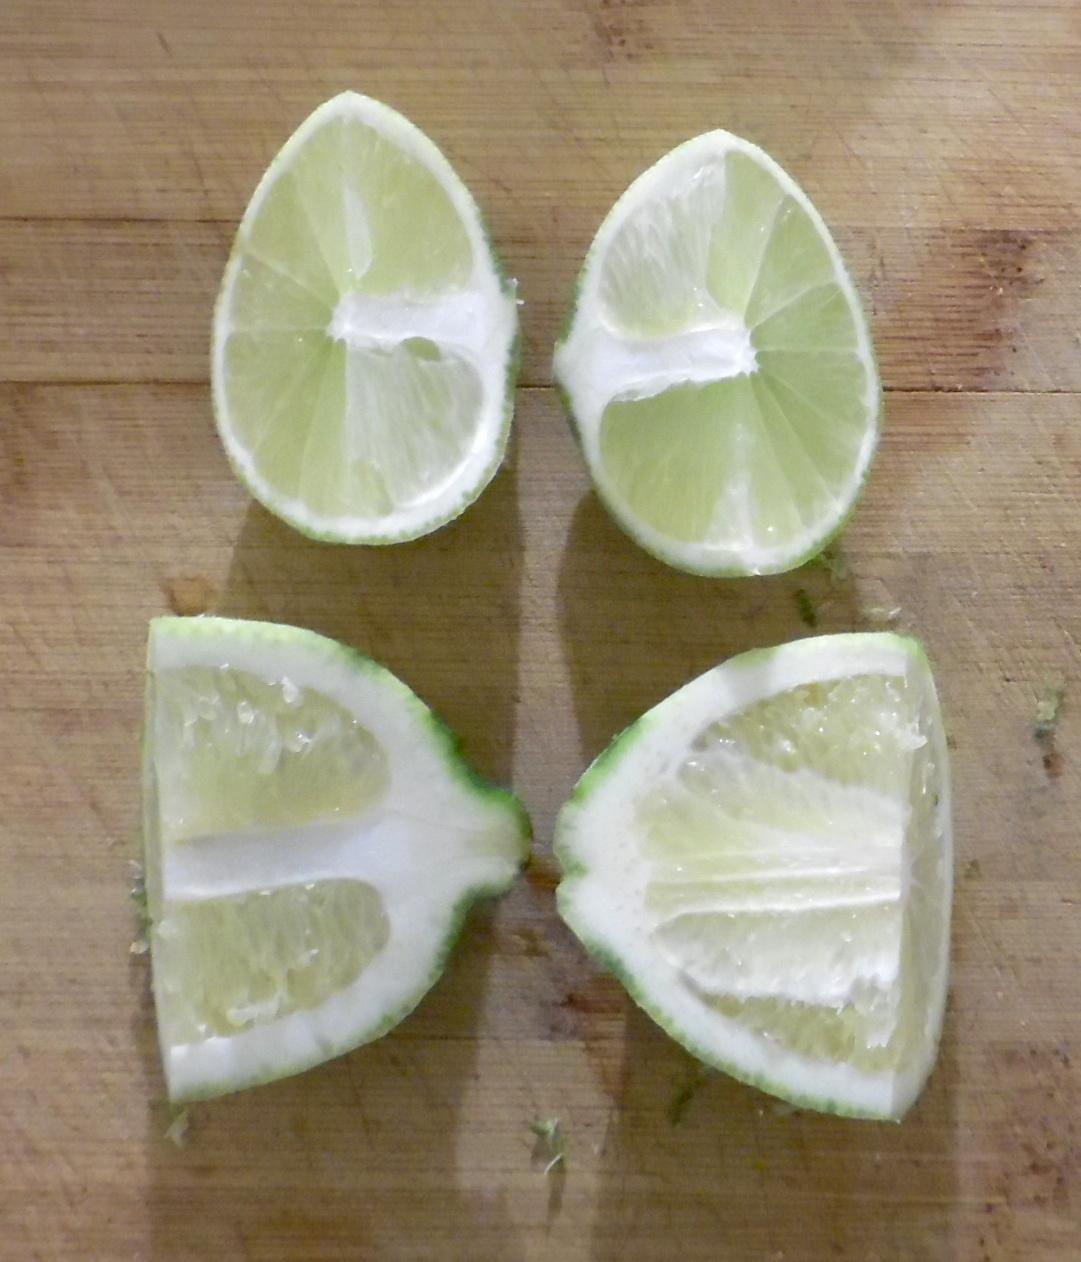 Limes quartered for juicing.